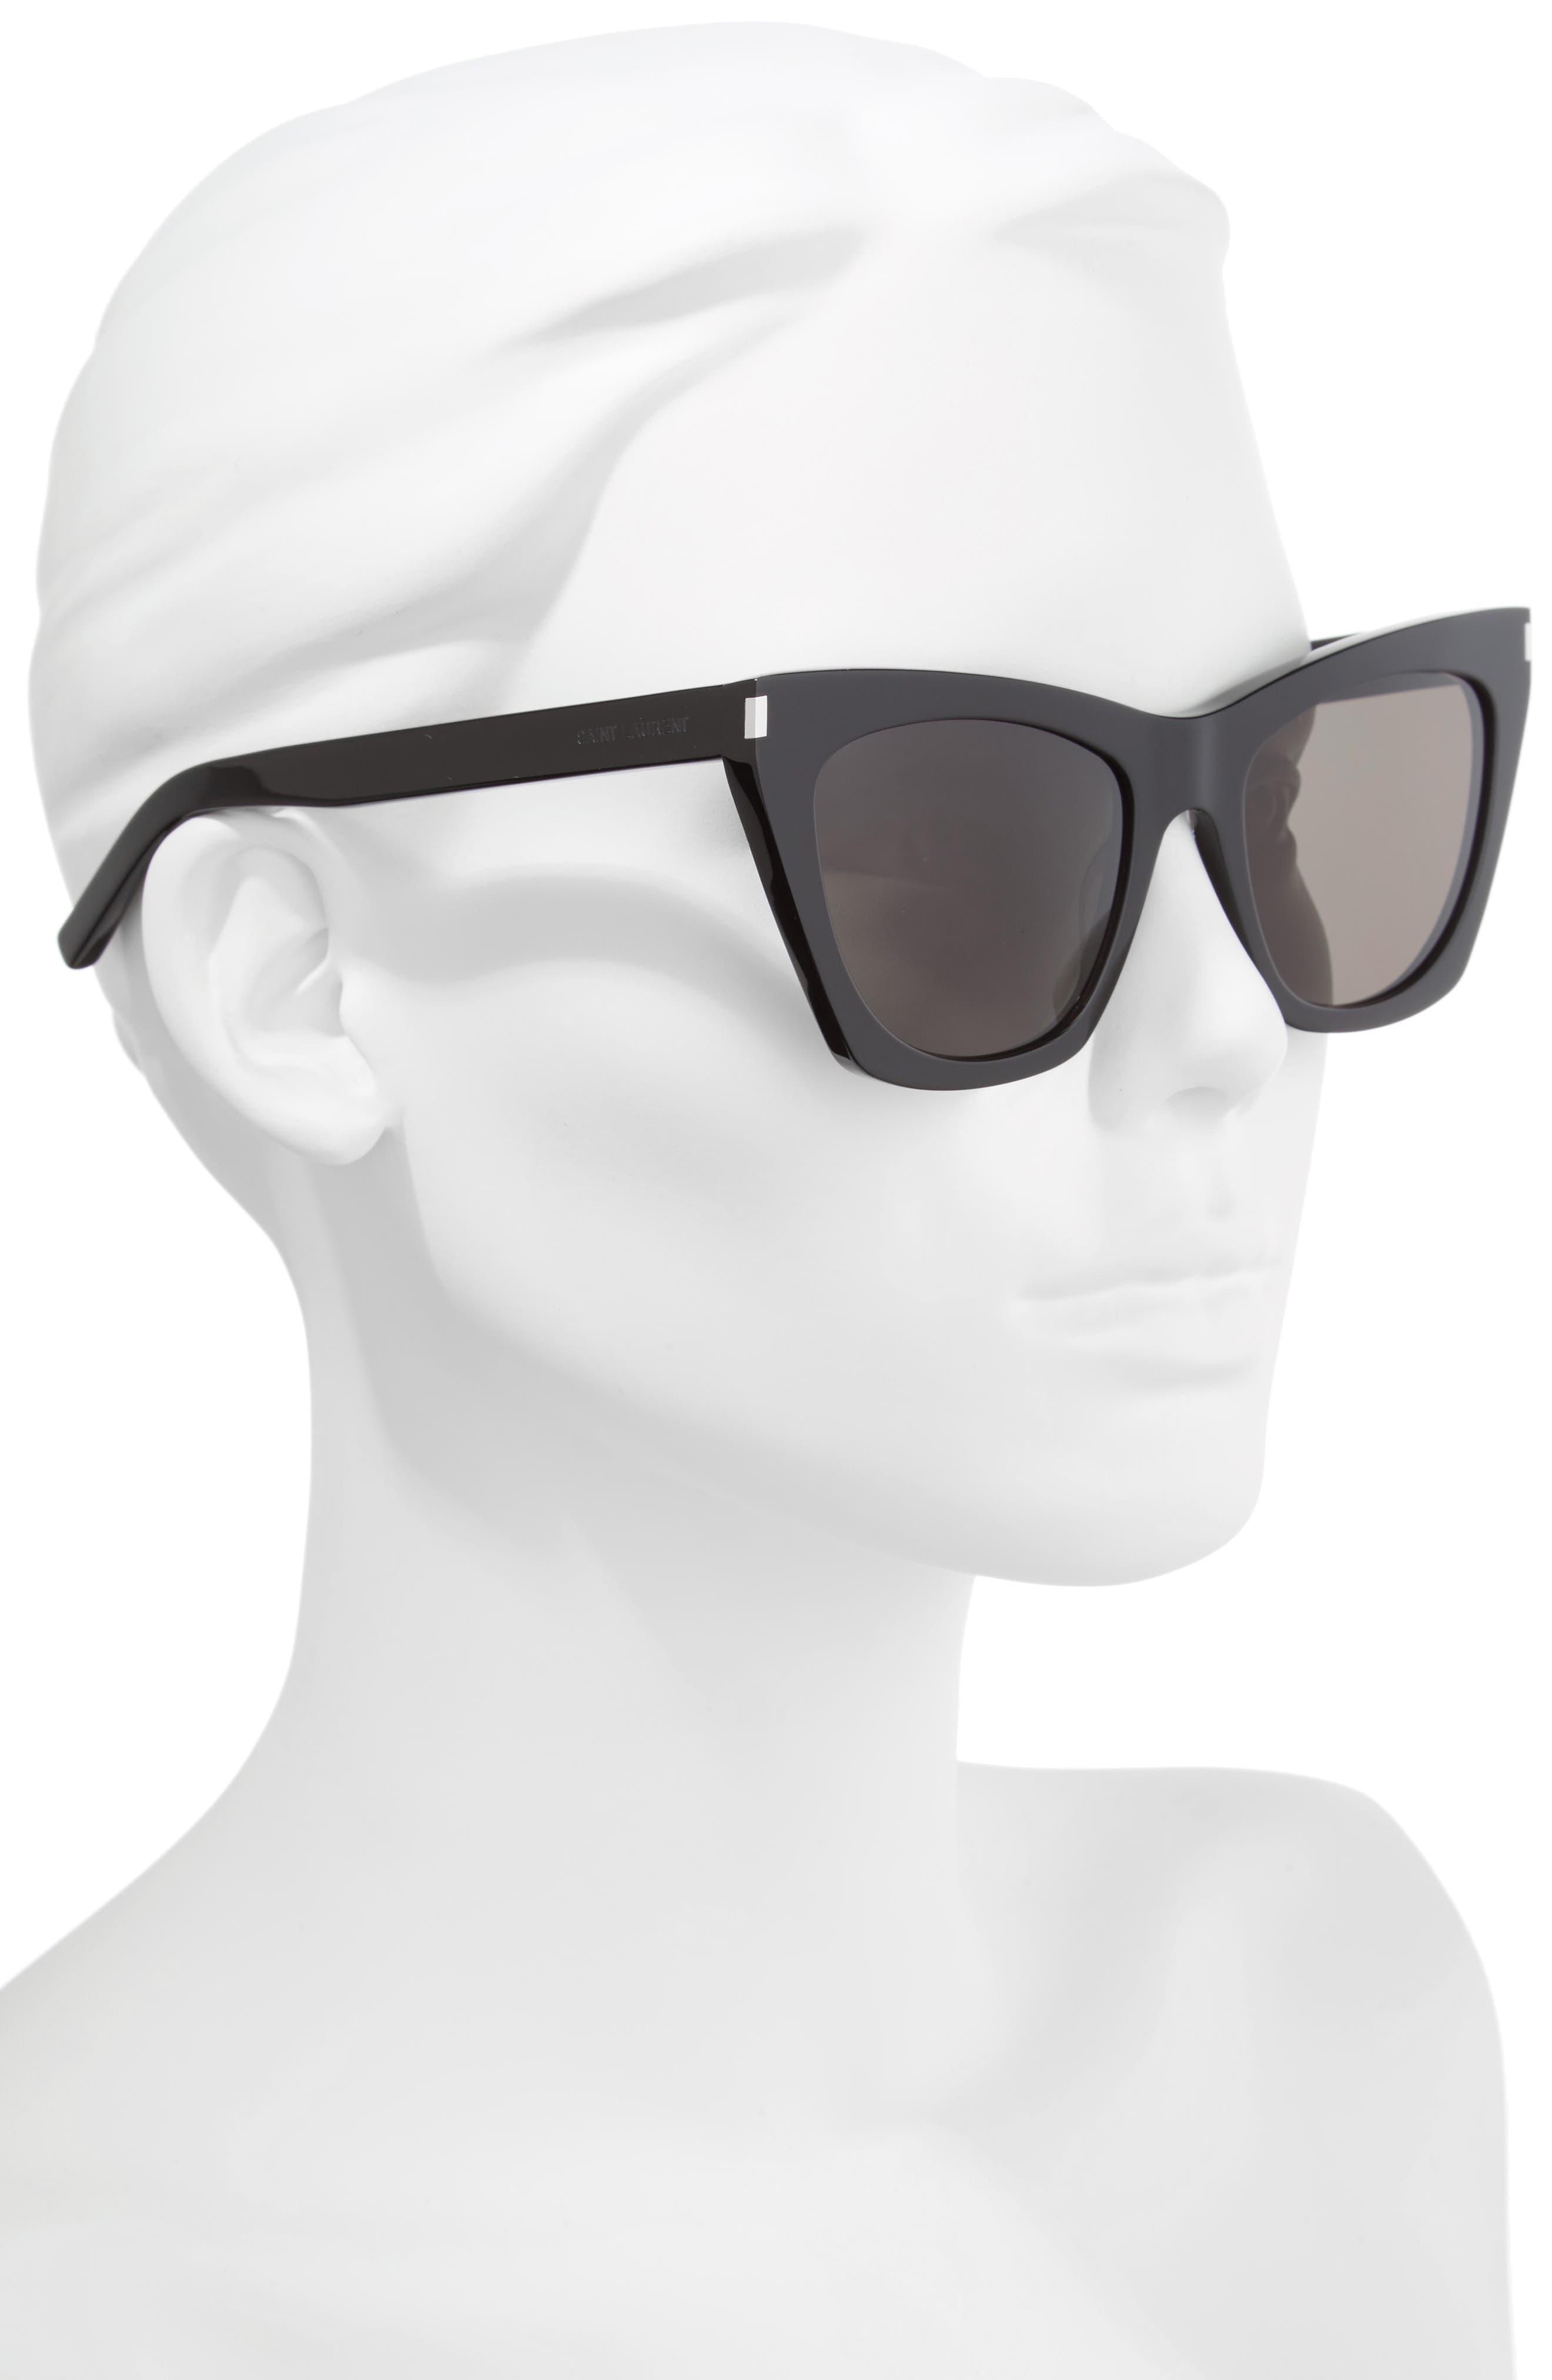 Kate 55mm Cat Eye Sunglasses,                             Alternate thumbnail 2, color,                             BLACK